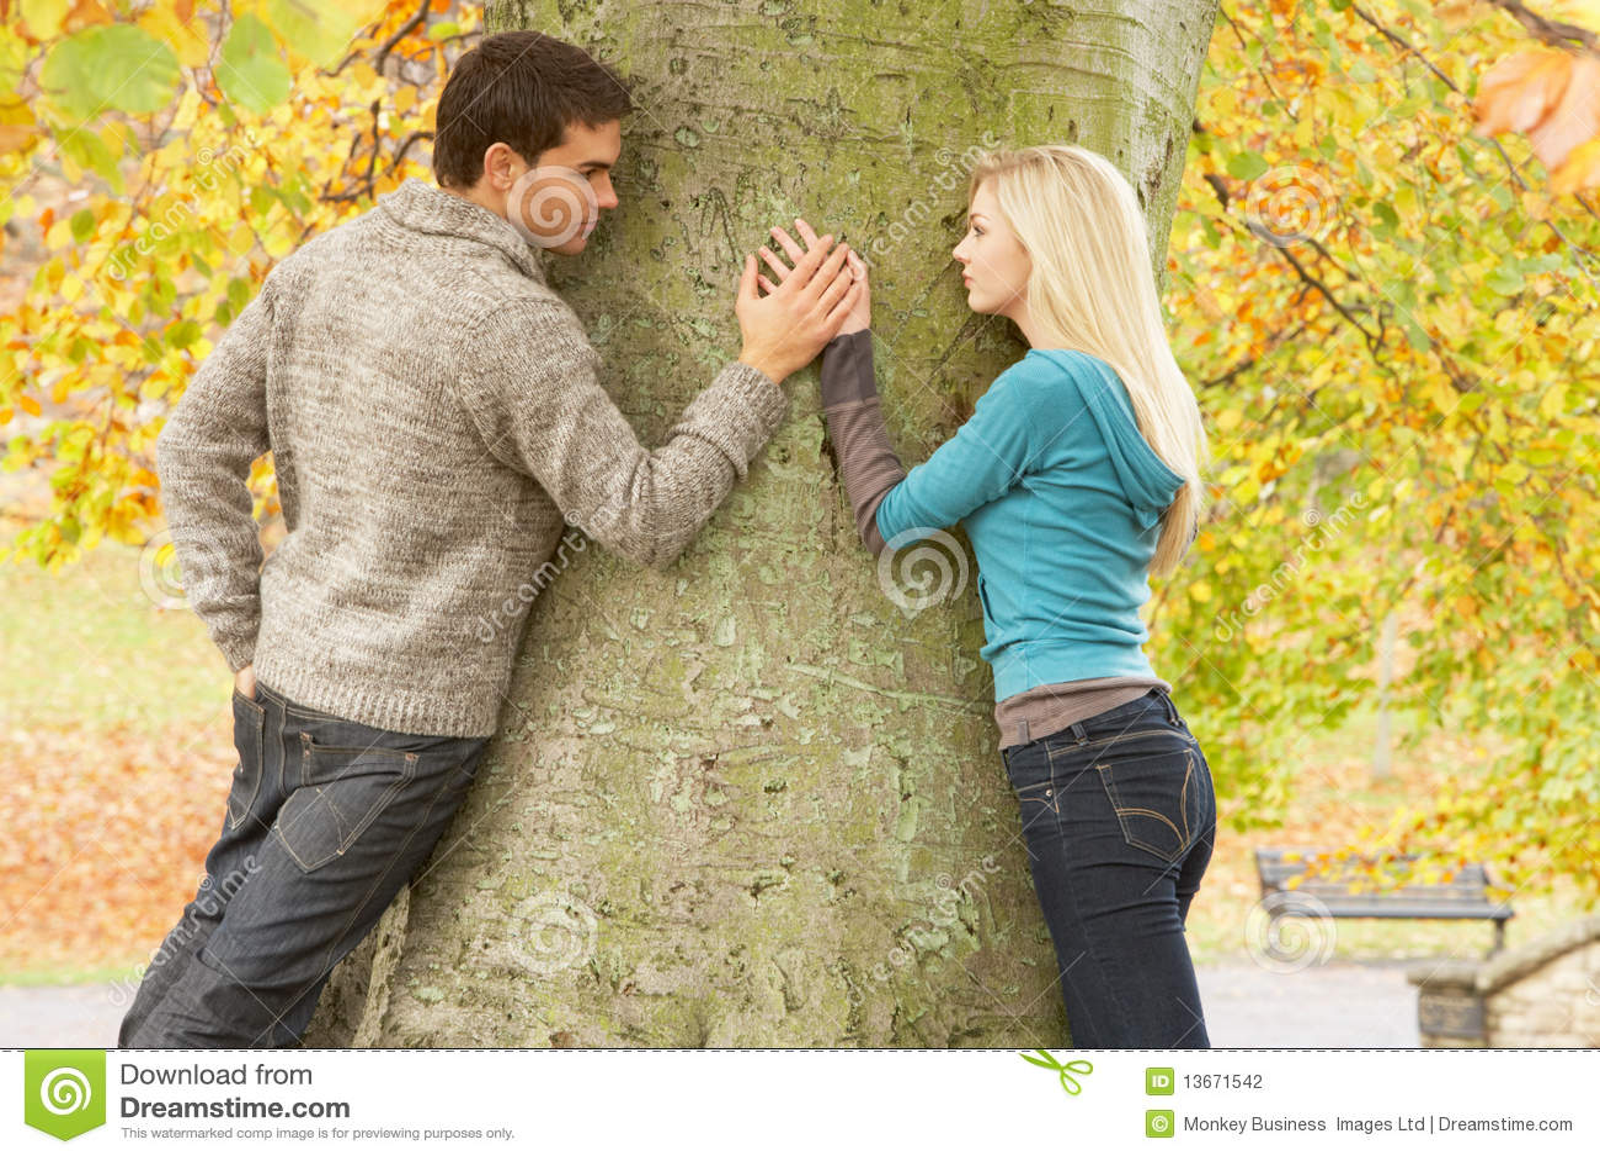 Фото девушка и парень в месте